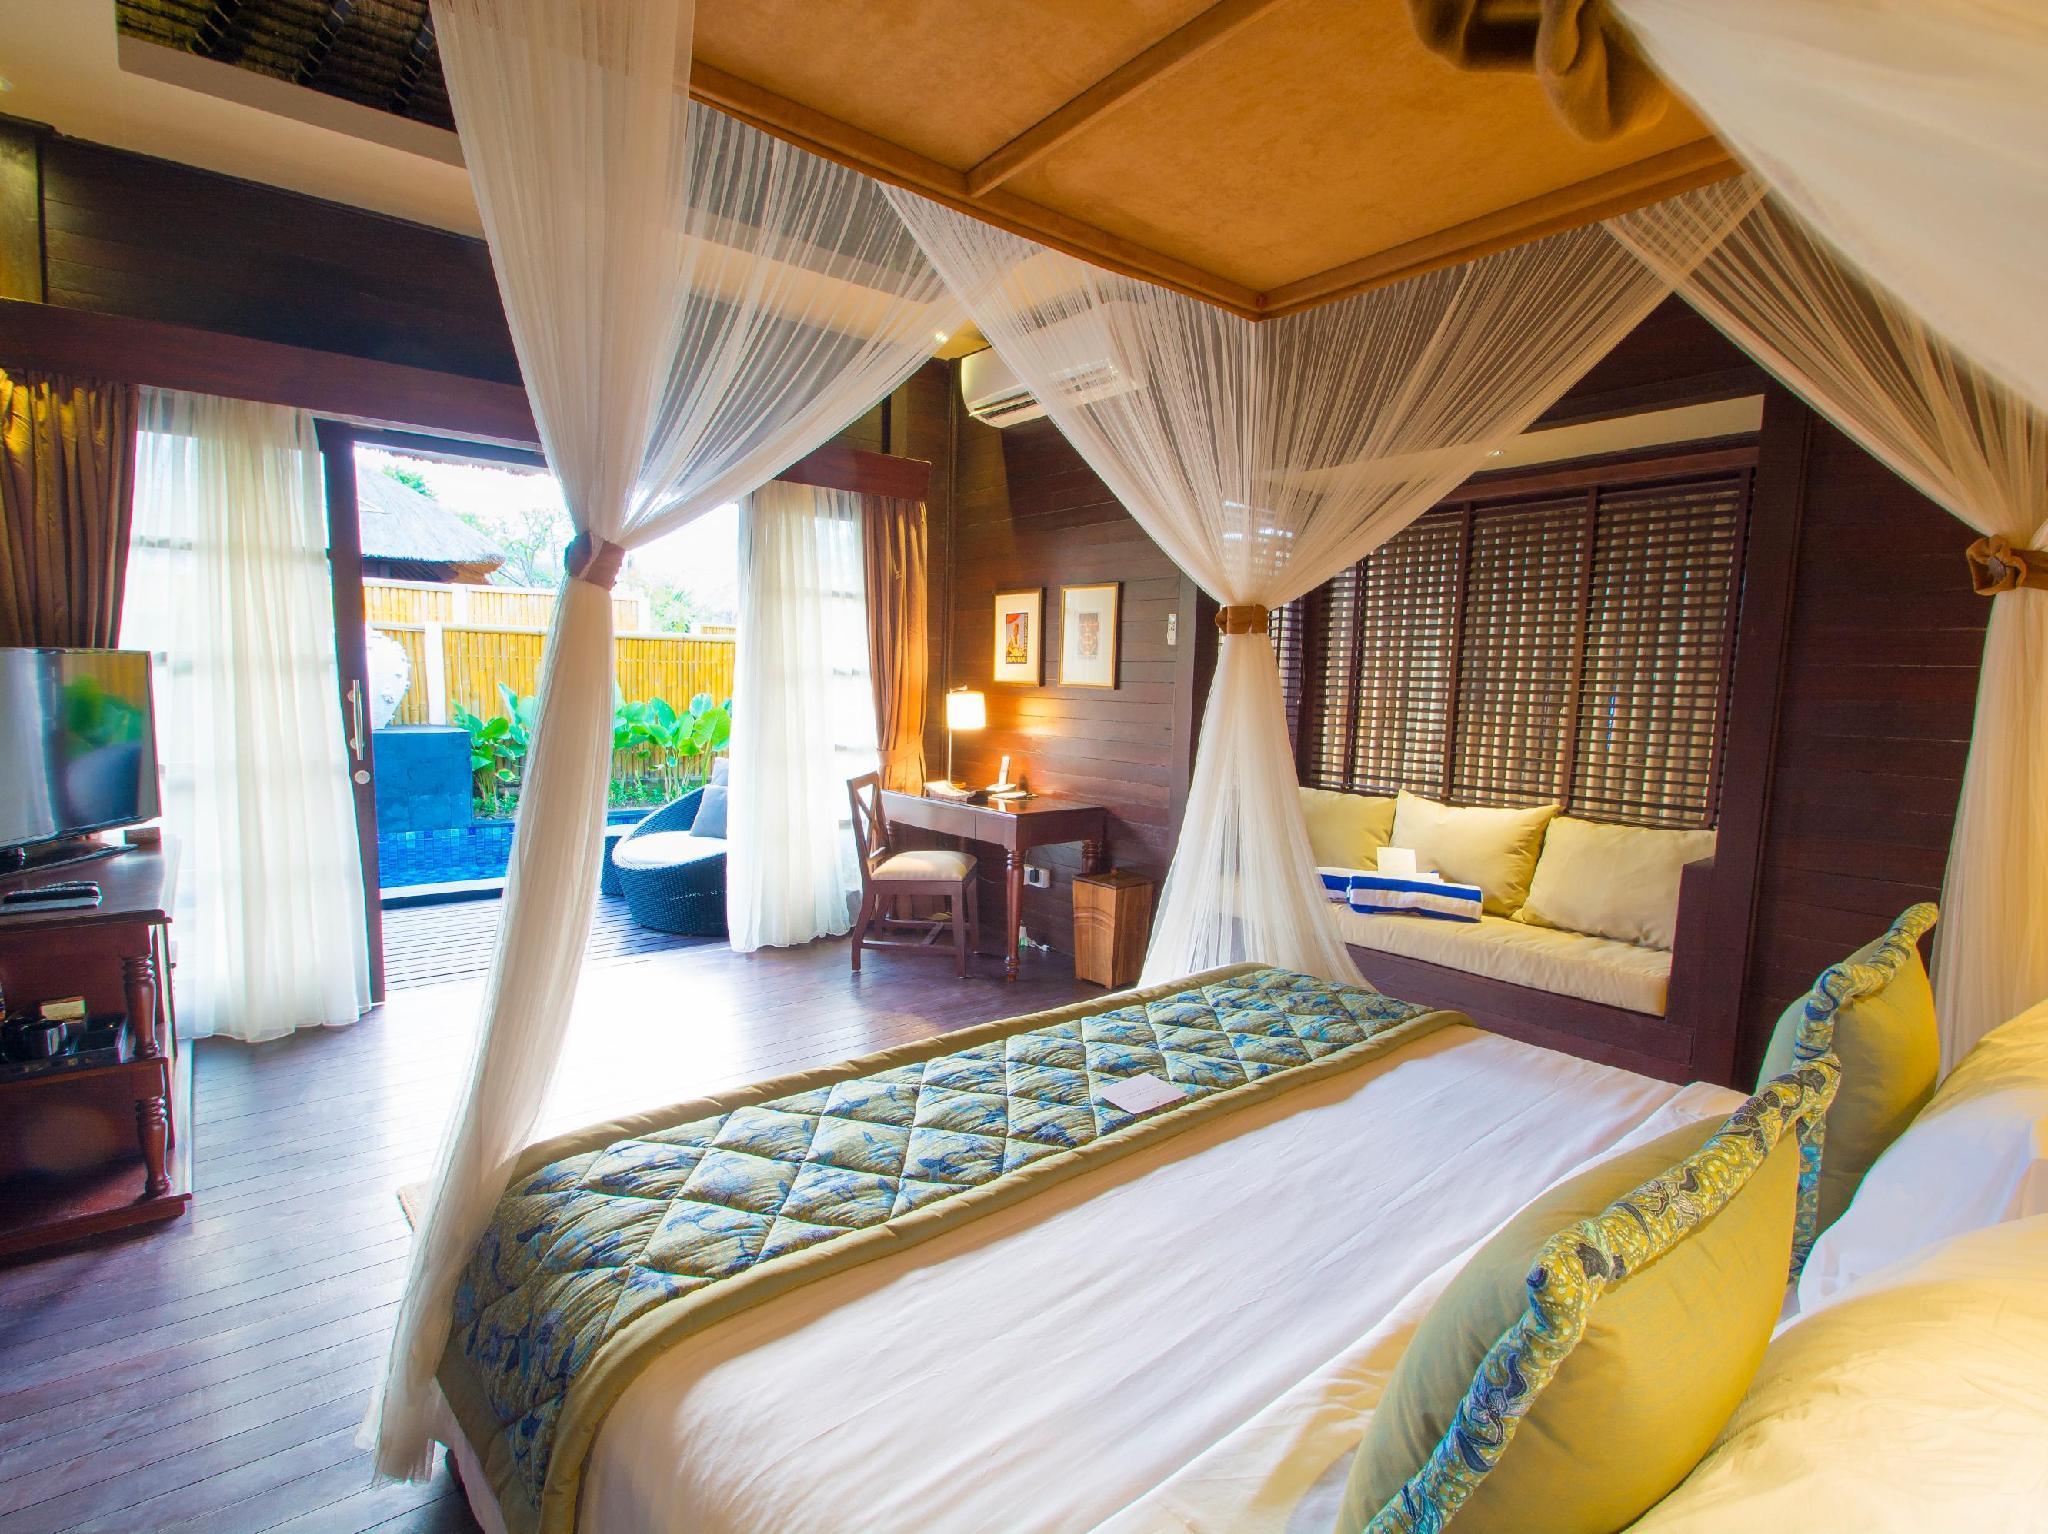 Lembongan Beach Club & Resort, Bali - Boek een aanbieding op Agoda.com